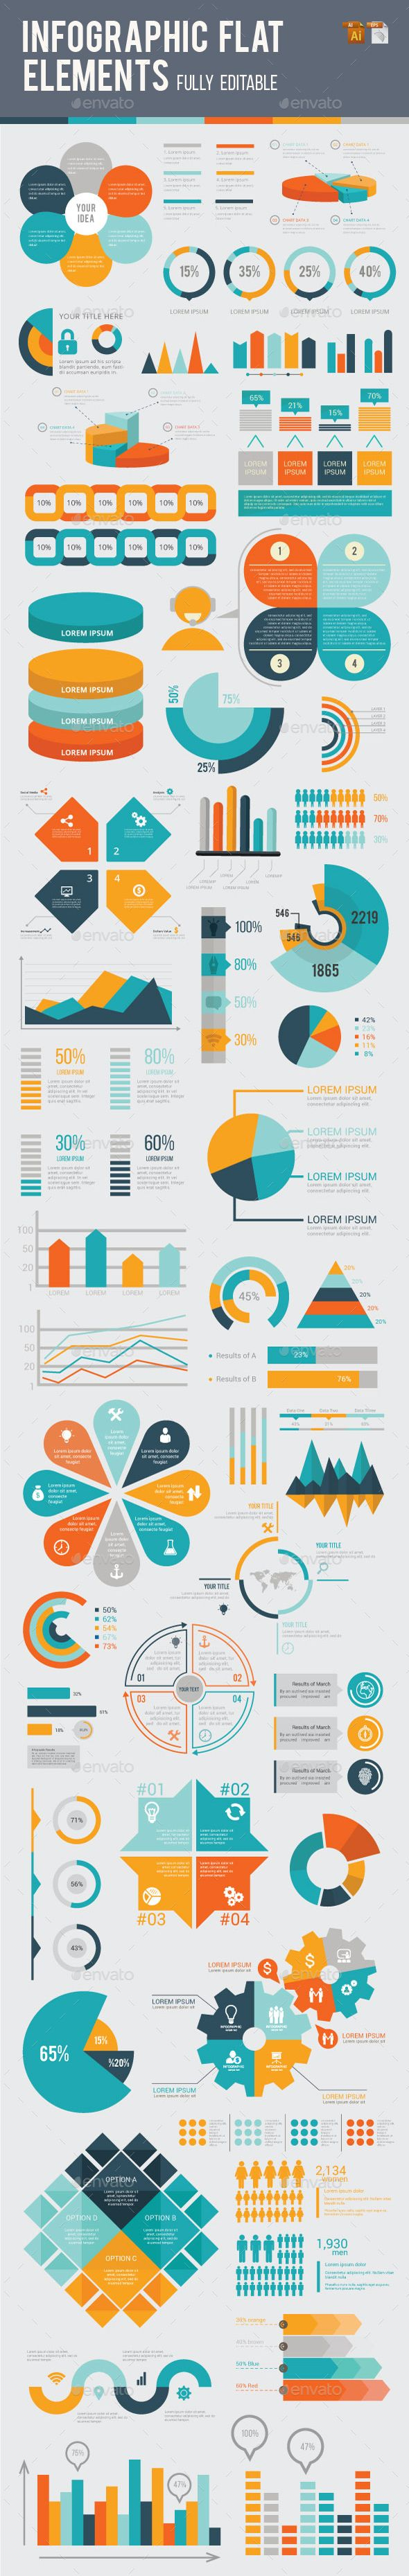 Infographic Flat Elements Design Template Vector EPS, AI Illustrator